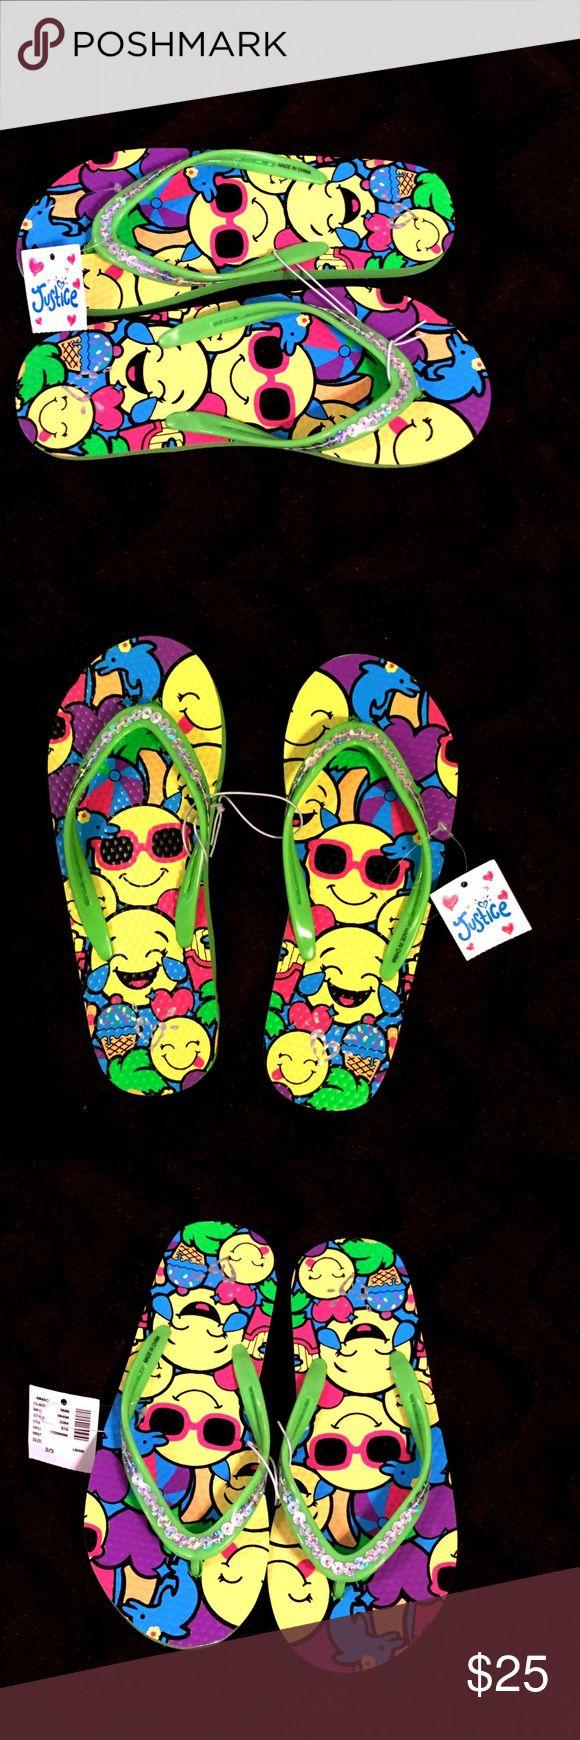 NWT ❤️ EMOJI Justice Flip Flops ❤️ NWT ❤️ EMOJI Justice Flip Flops ❤️ Sz 2/3 Justice Shoes Sandals & Flip Flops